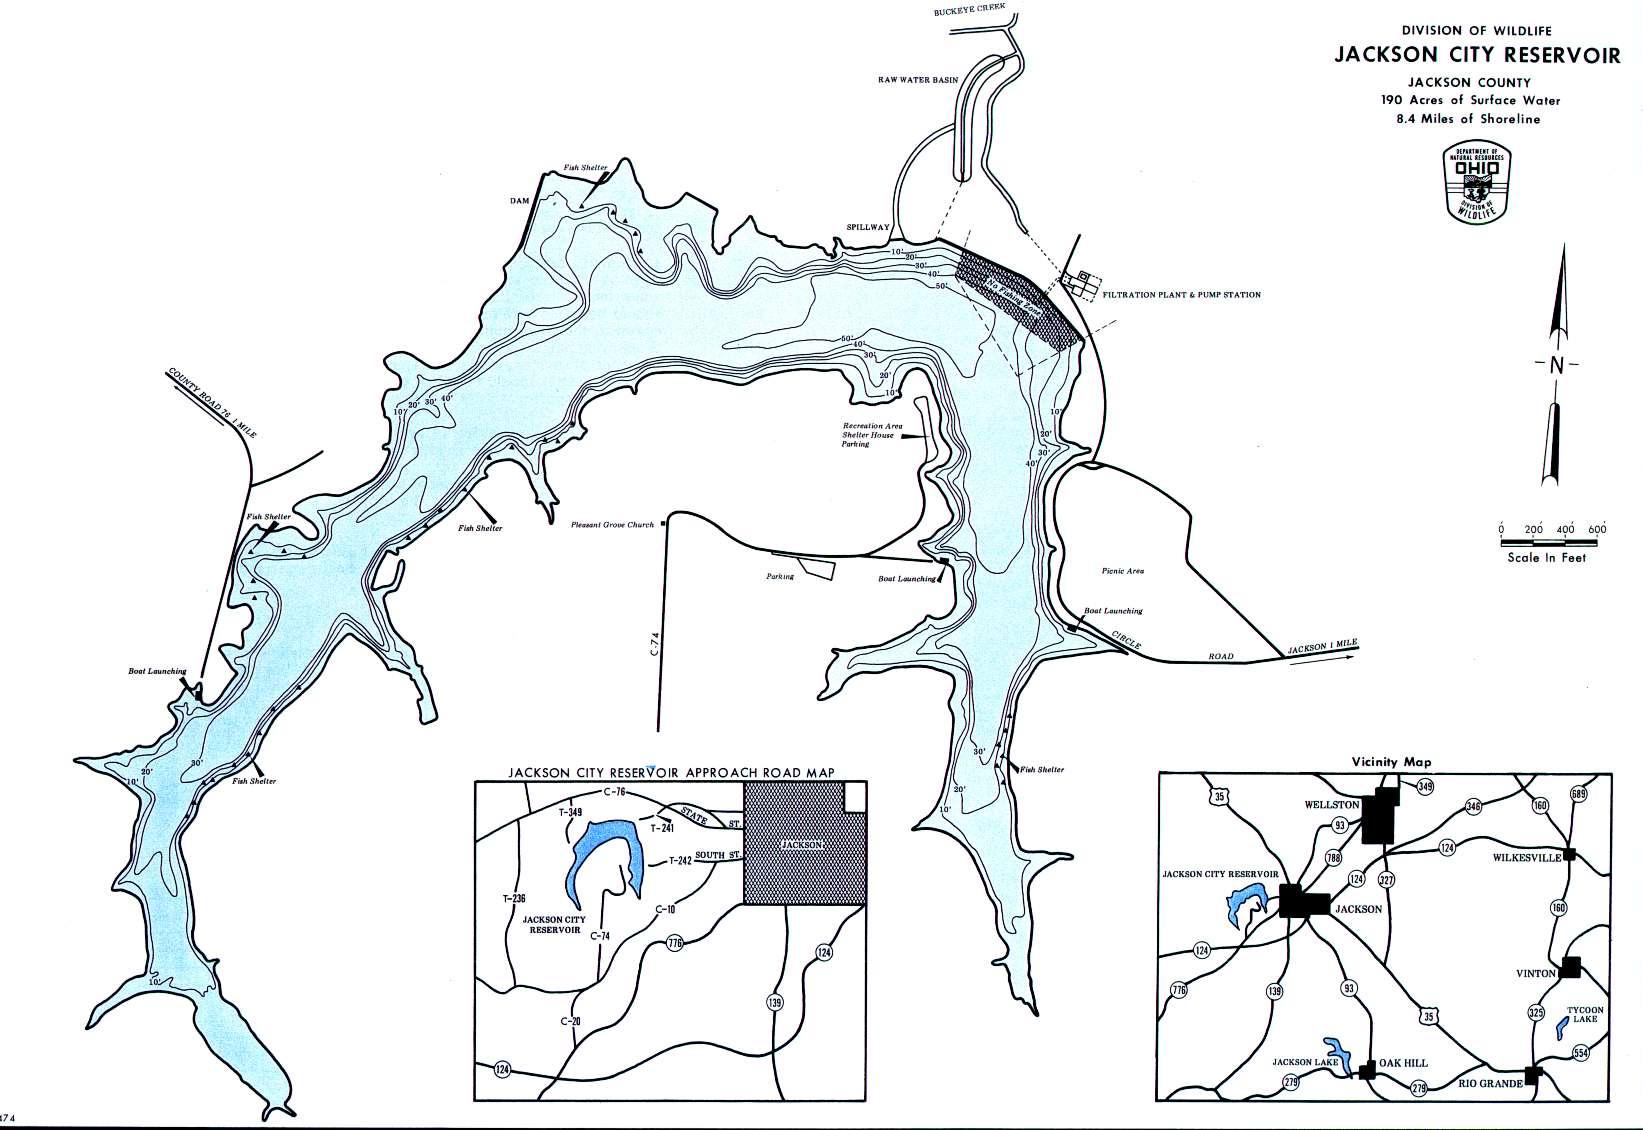 Jackson City Reservoir Fishing Map - GoFishOhio